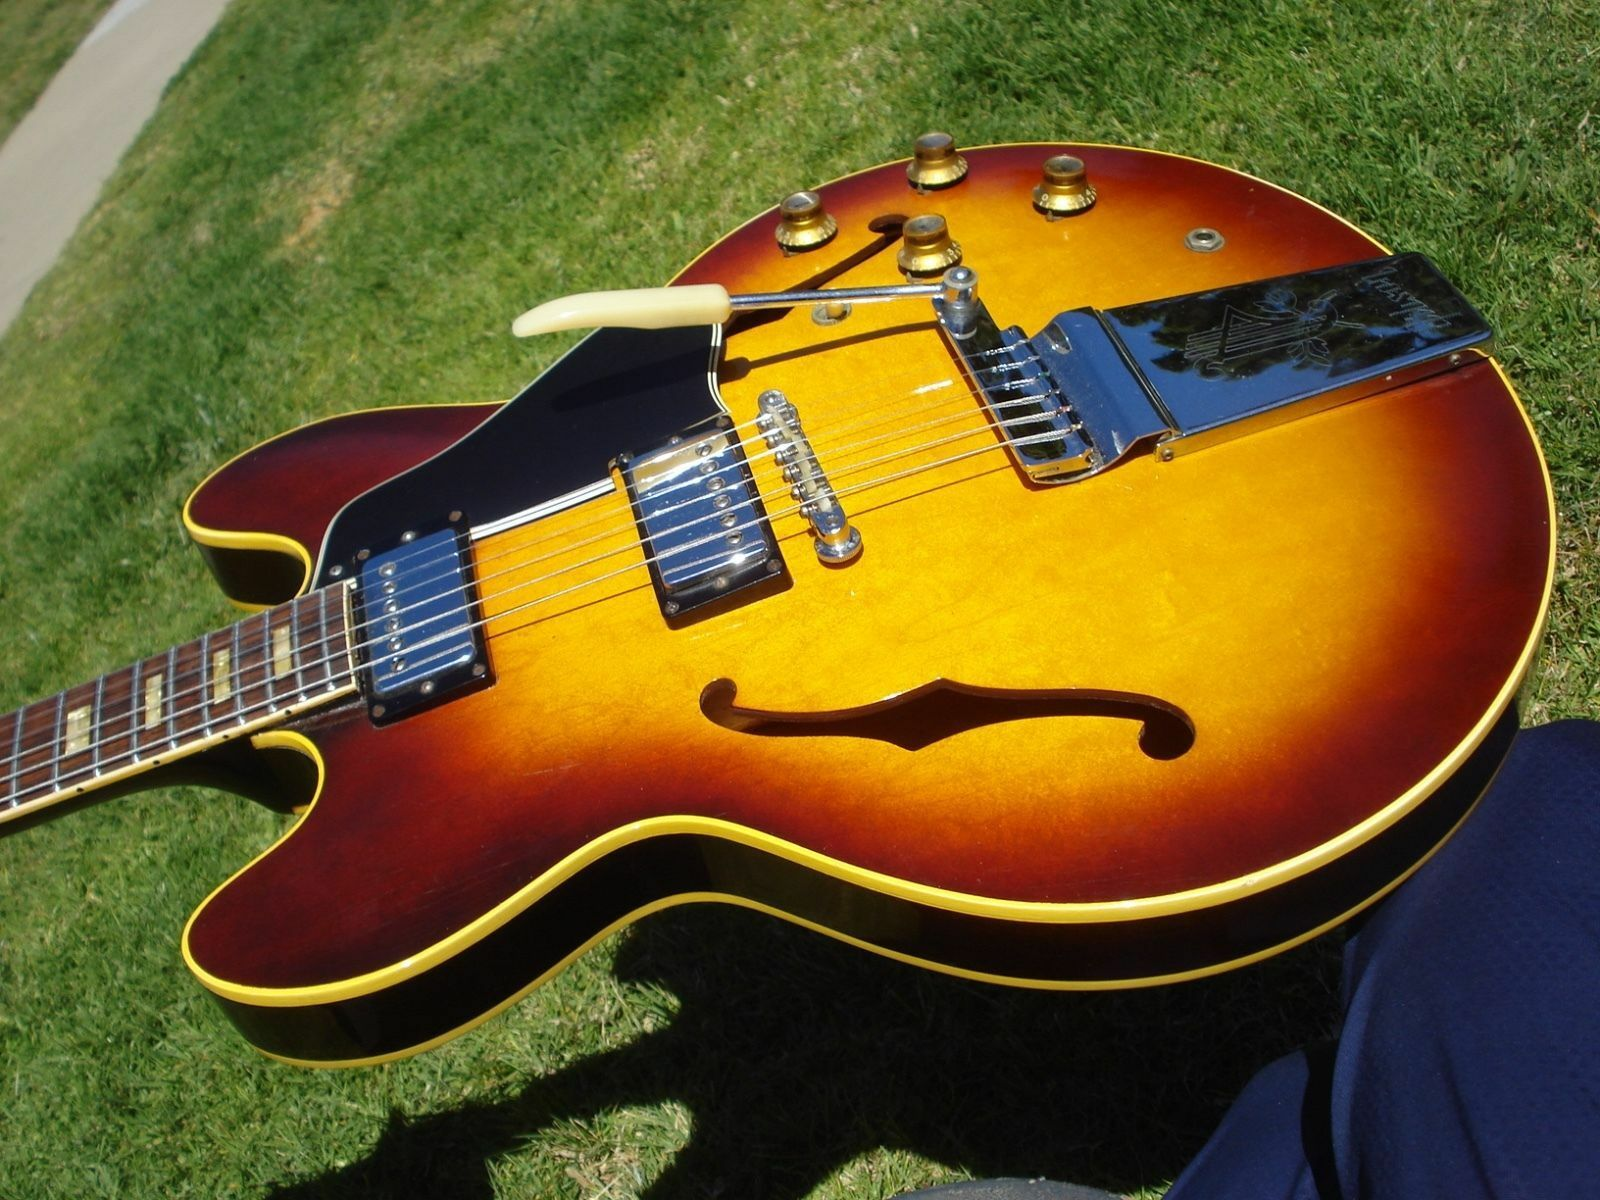 CWH1 Guitars